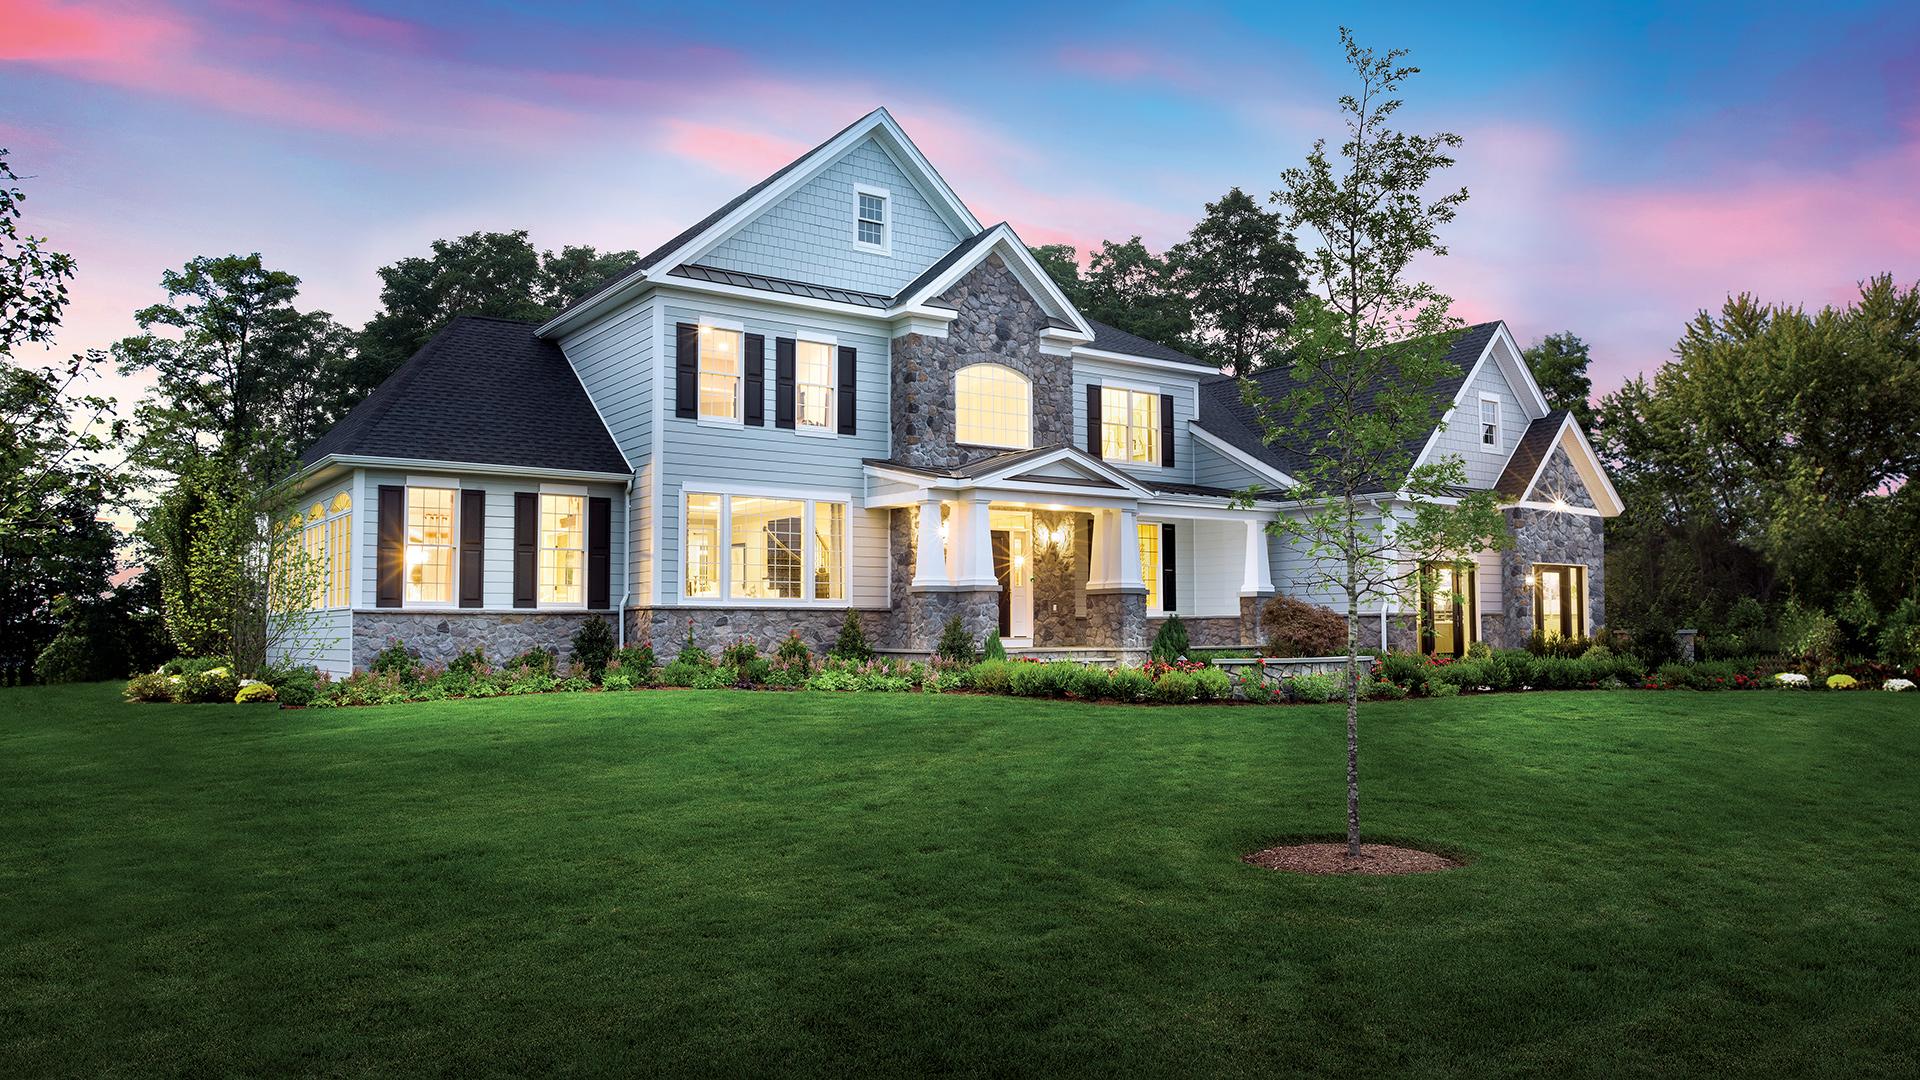 810 0344a CC Ret 1920 Top Result 50 Lovely Brand New Homes for Sale Image 2017 Hjr2